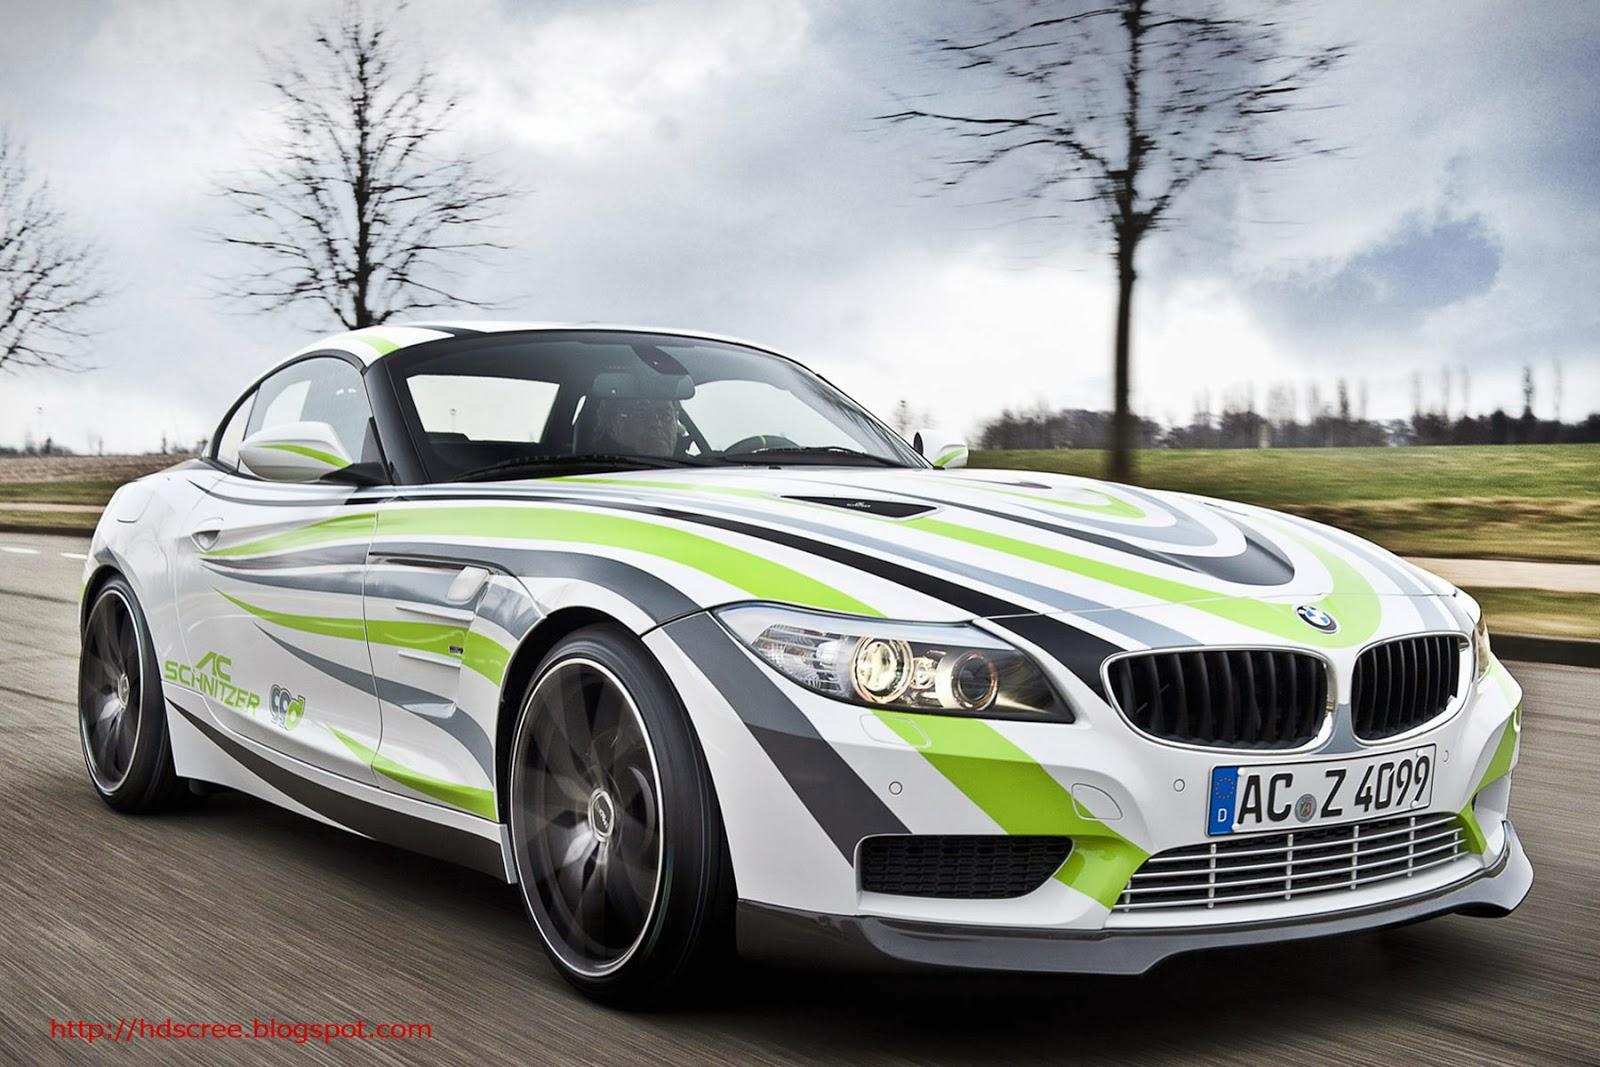 Best Wallpaper Mobil Sport: Best Sports Car's HD Wallpaper Download